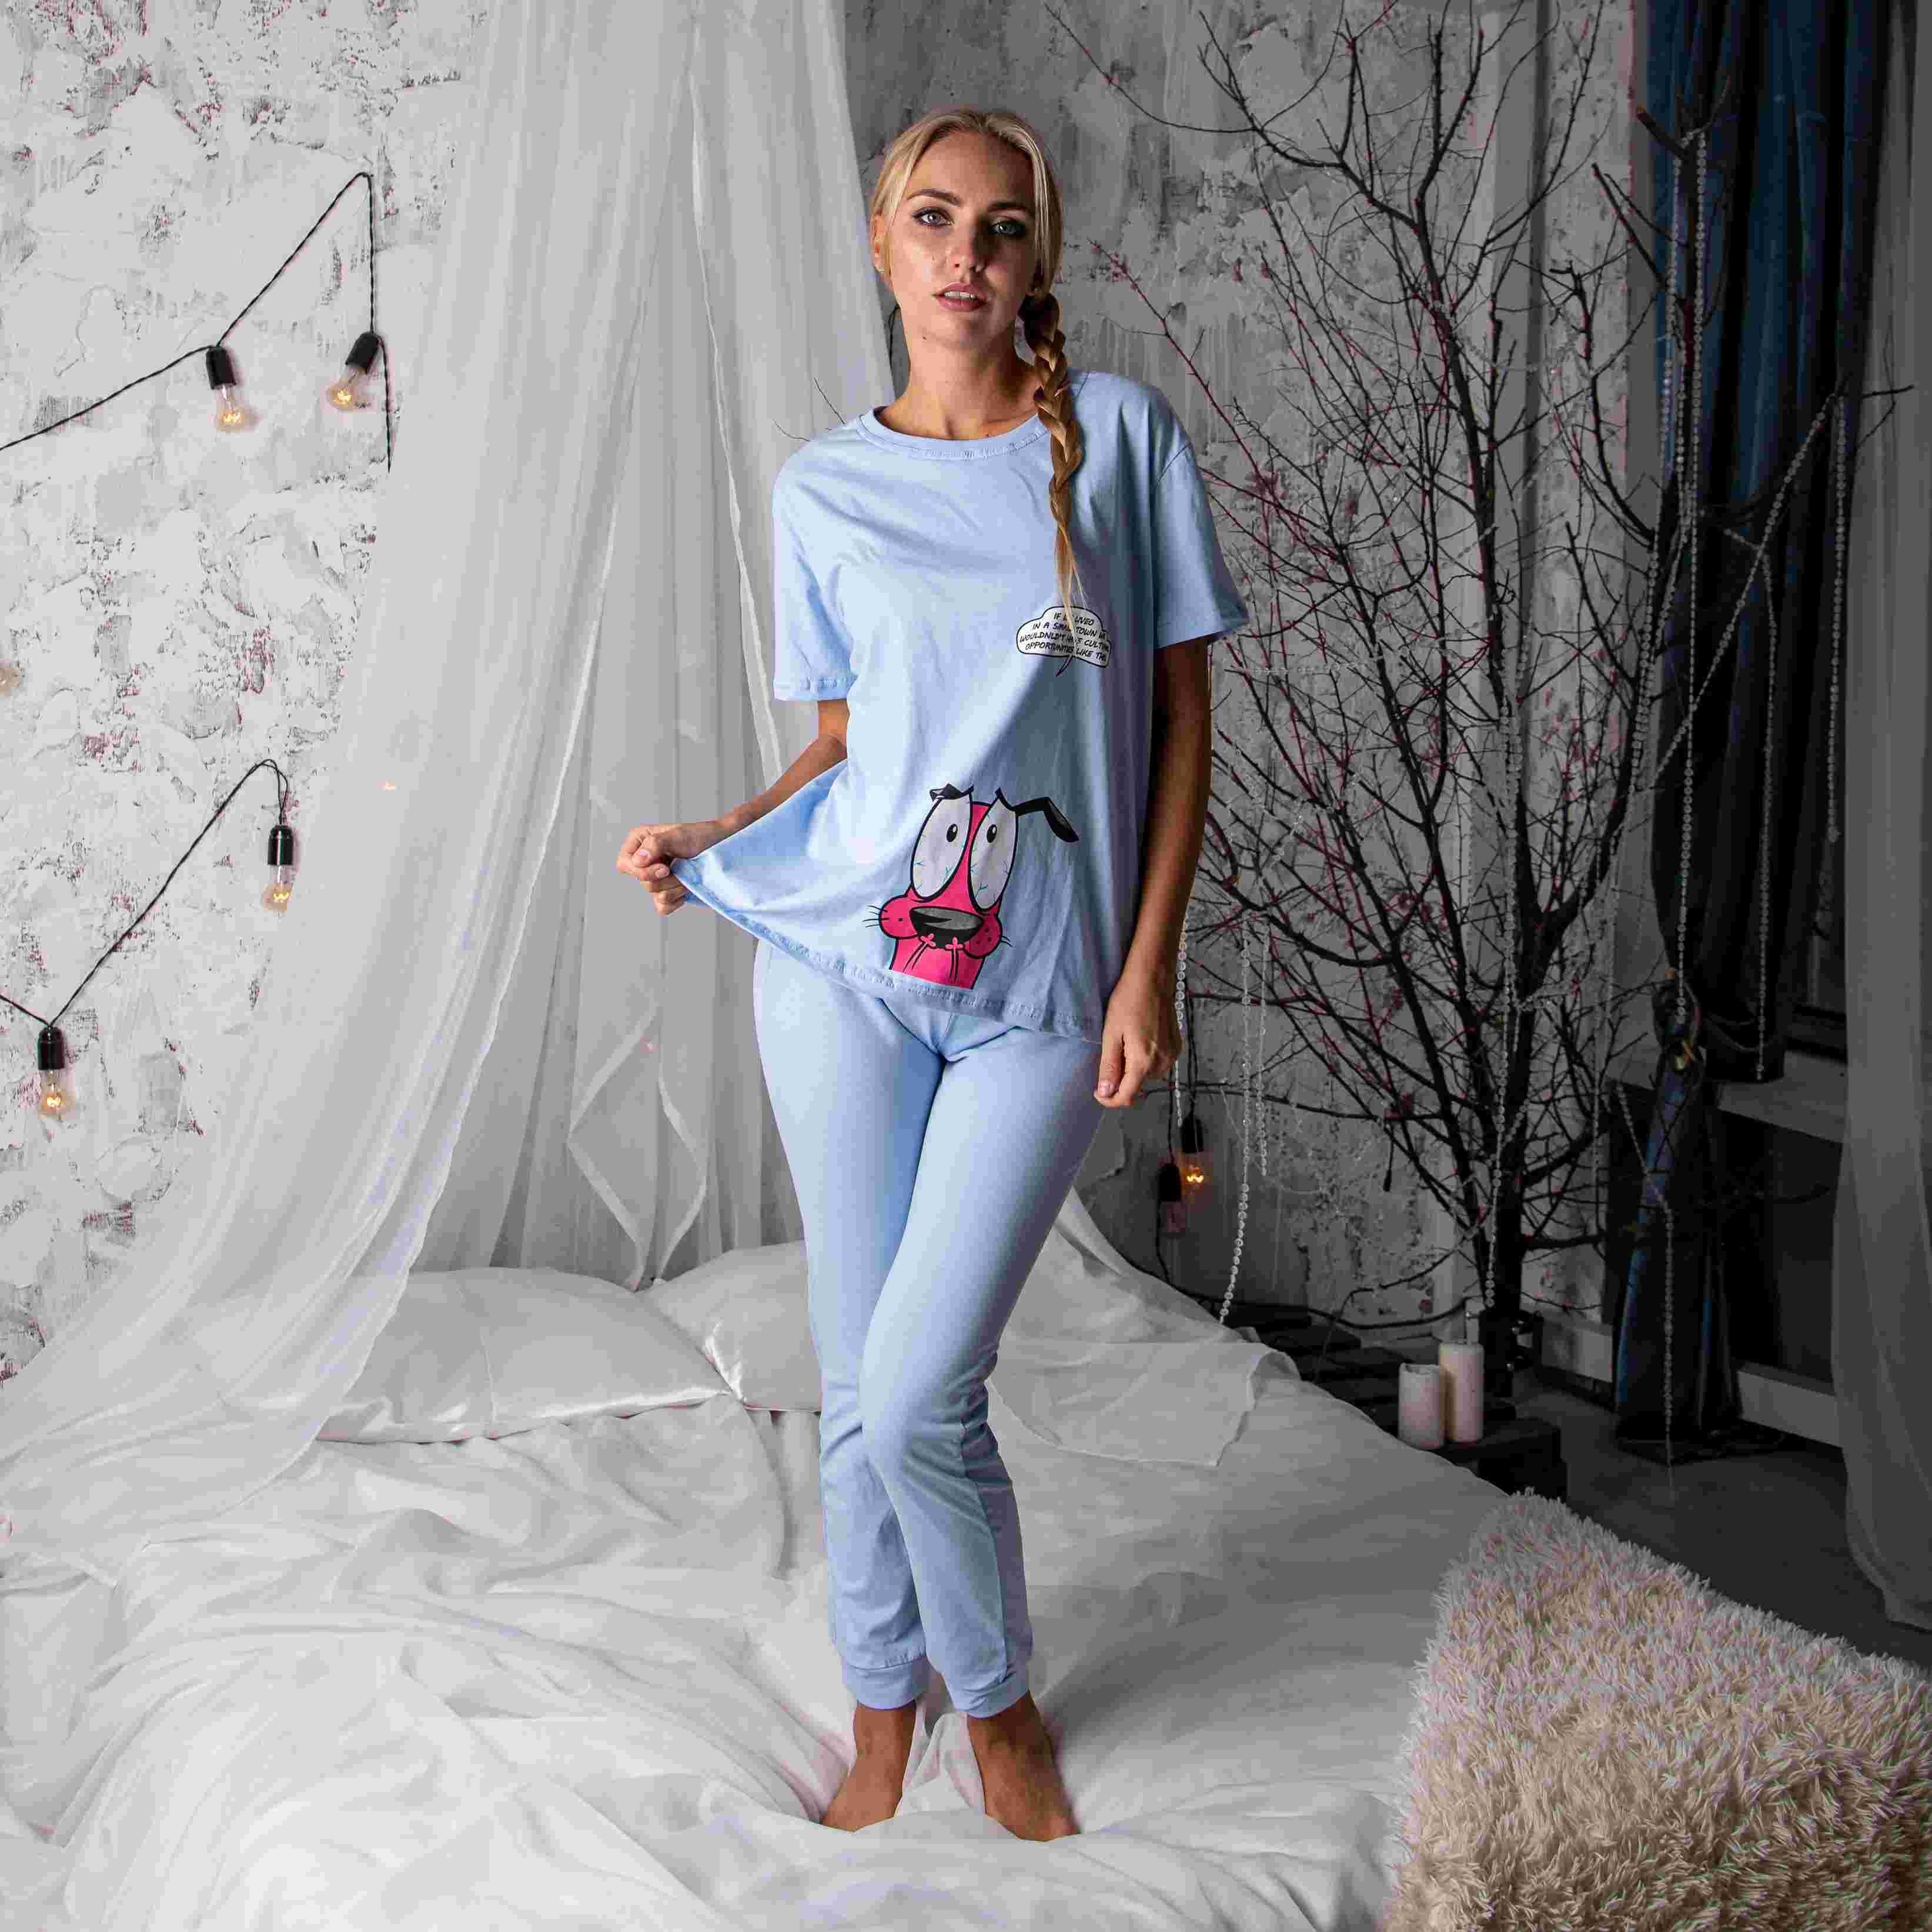 Atoff casa pijamas feminino zhp 030 (rosa/azul)